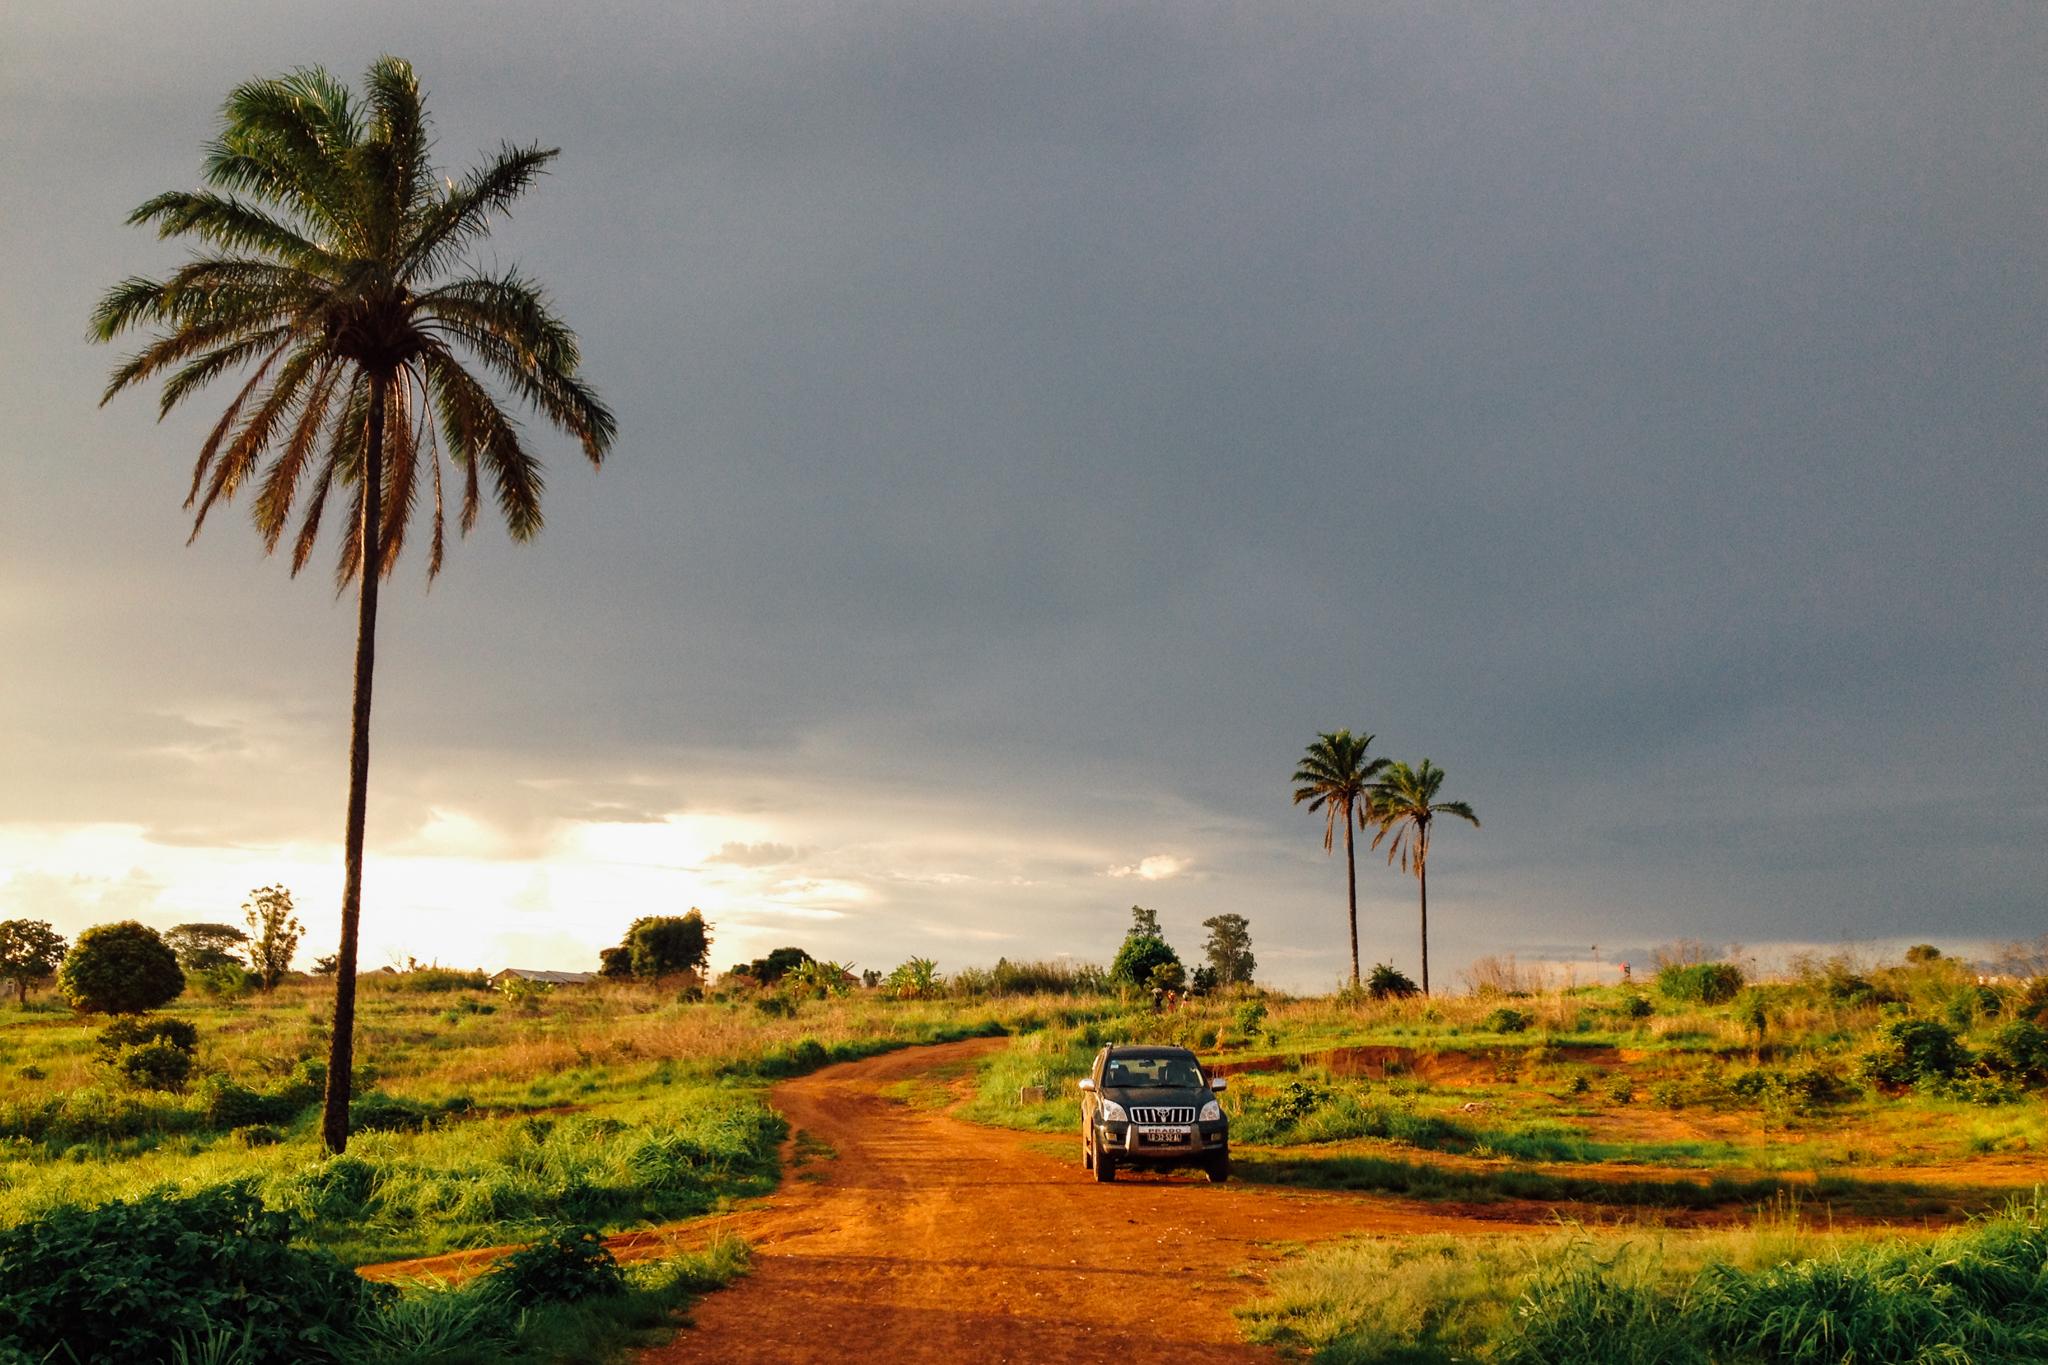 [2014] iPhone 4S - Cuemba, Angola